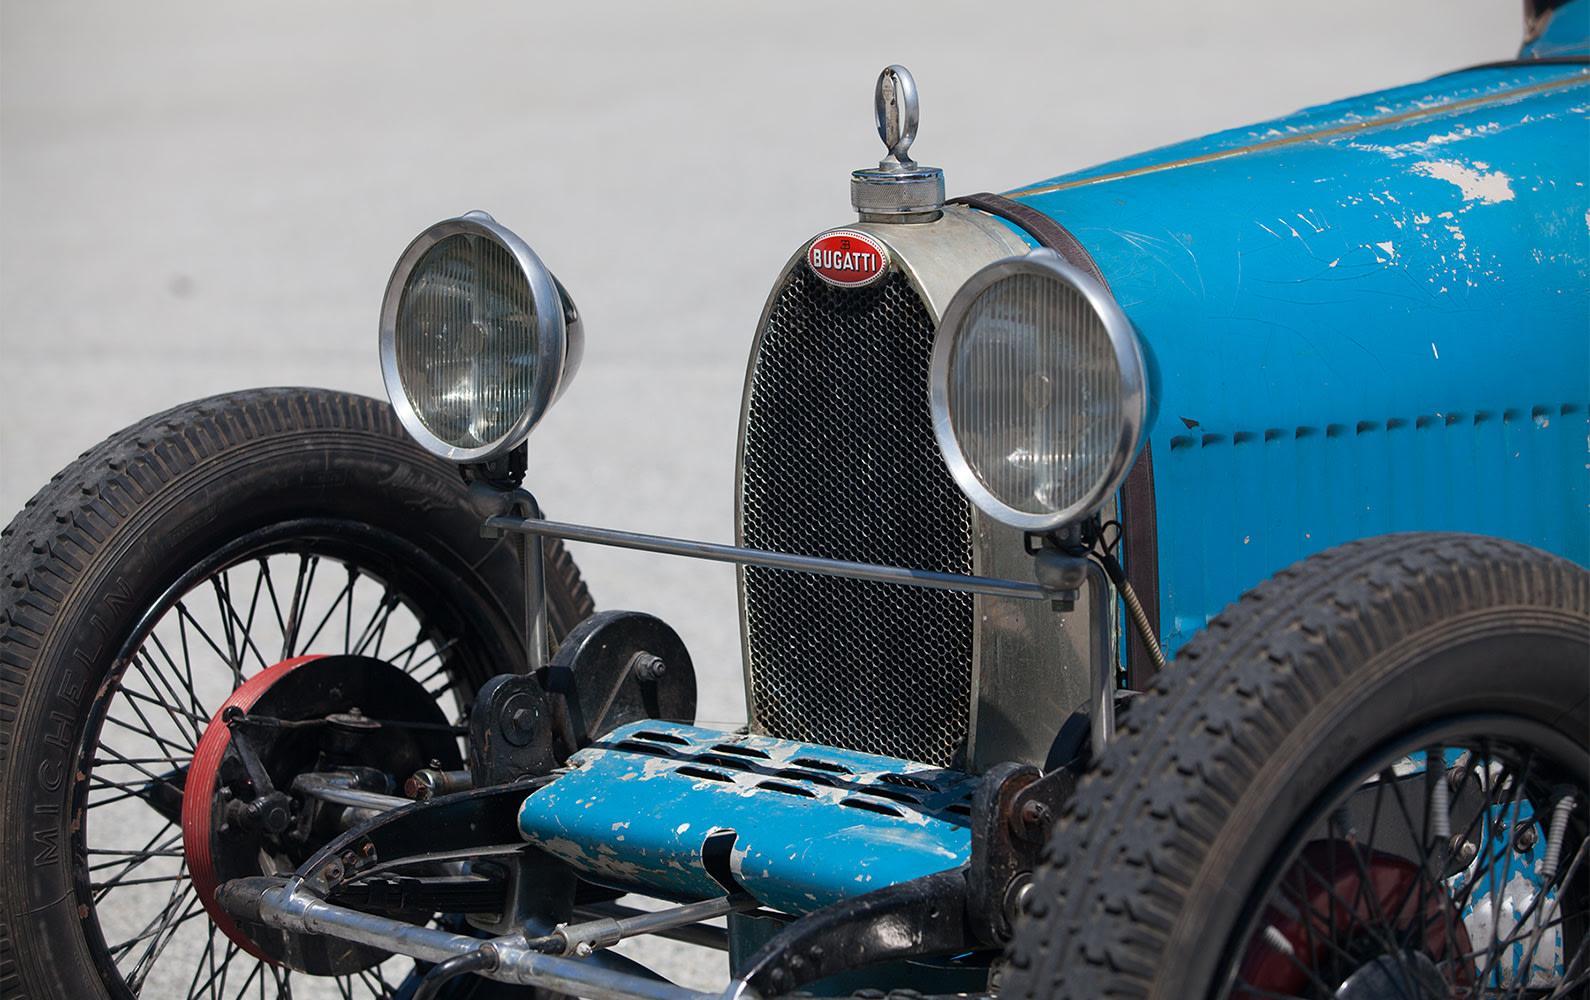 1926 Bugatti Type 37 Grand Prix front detail